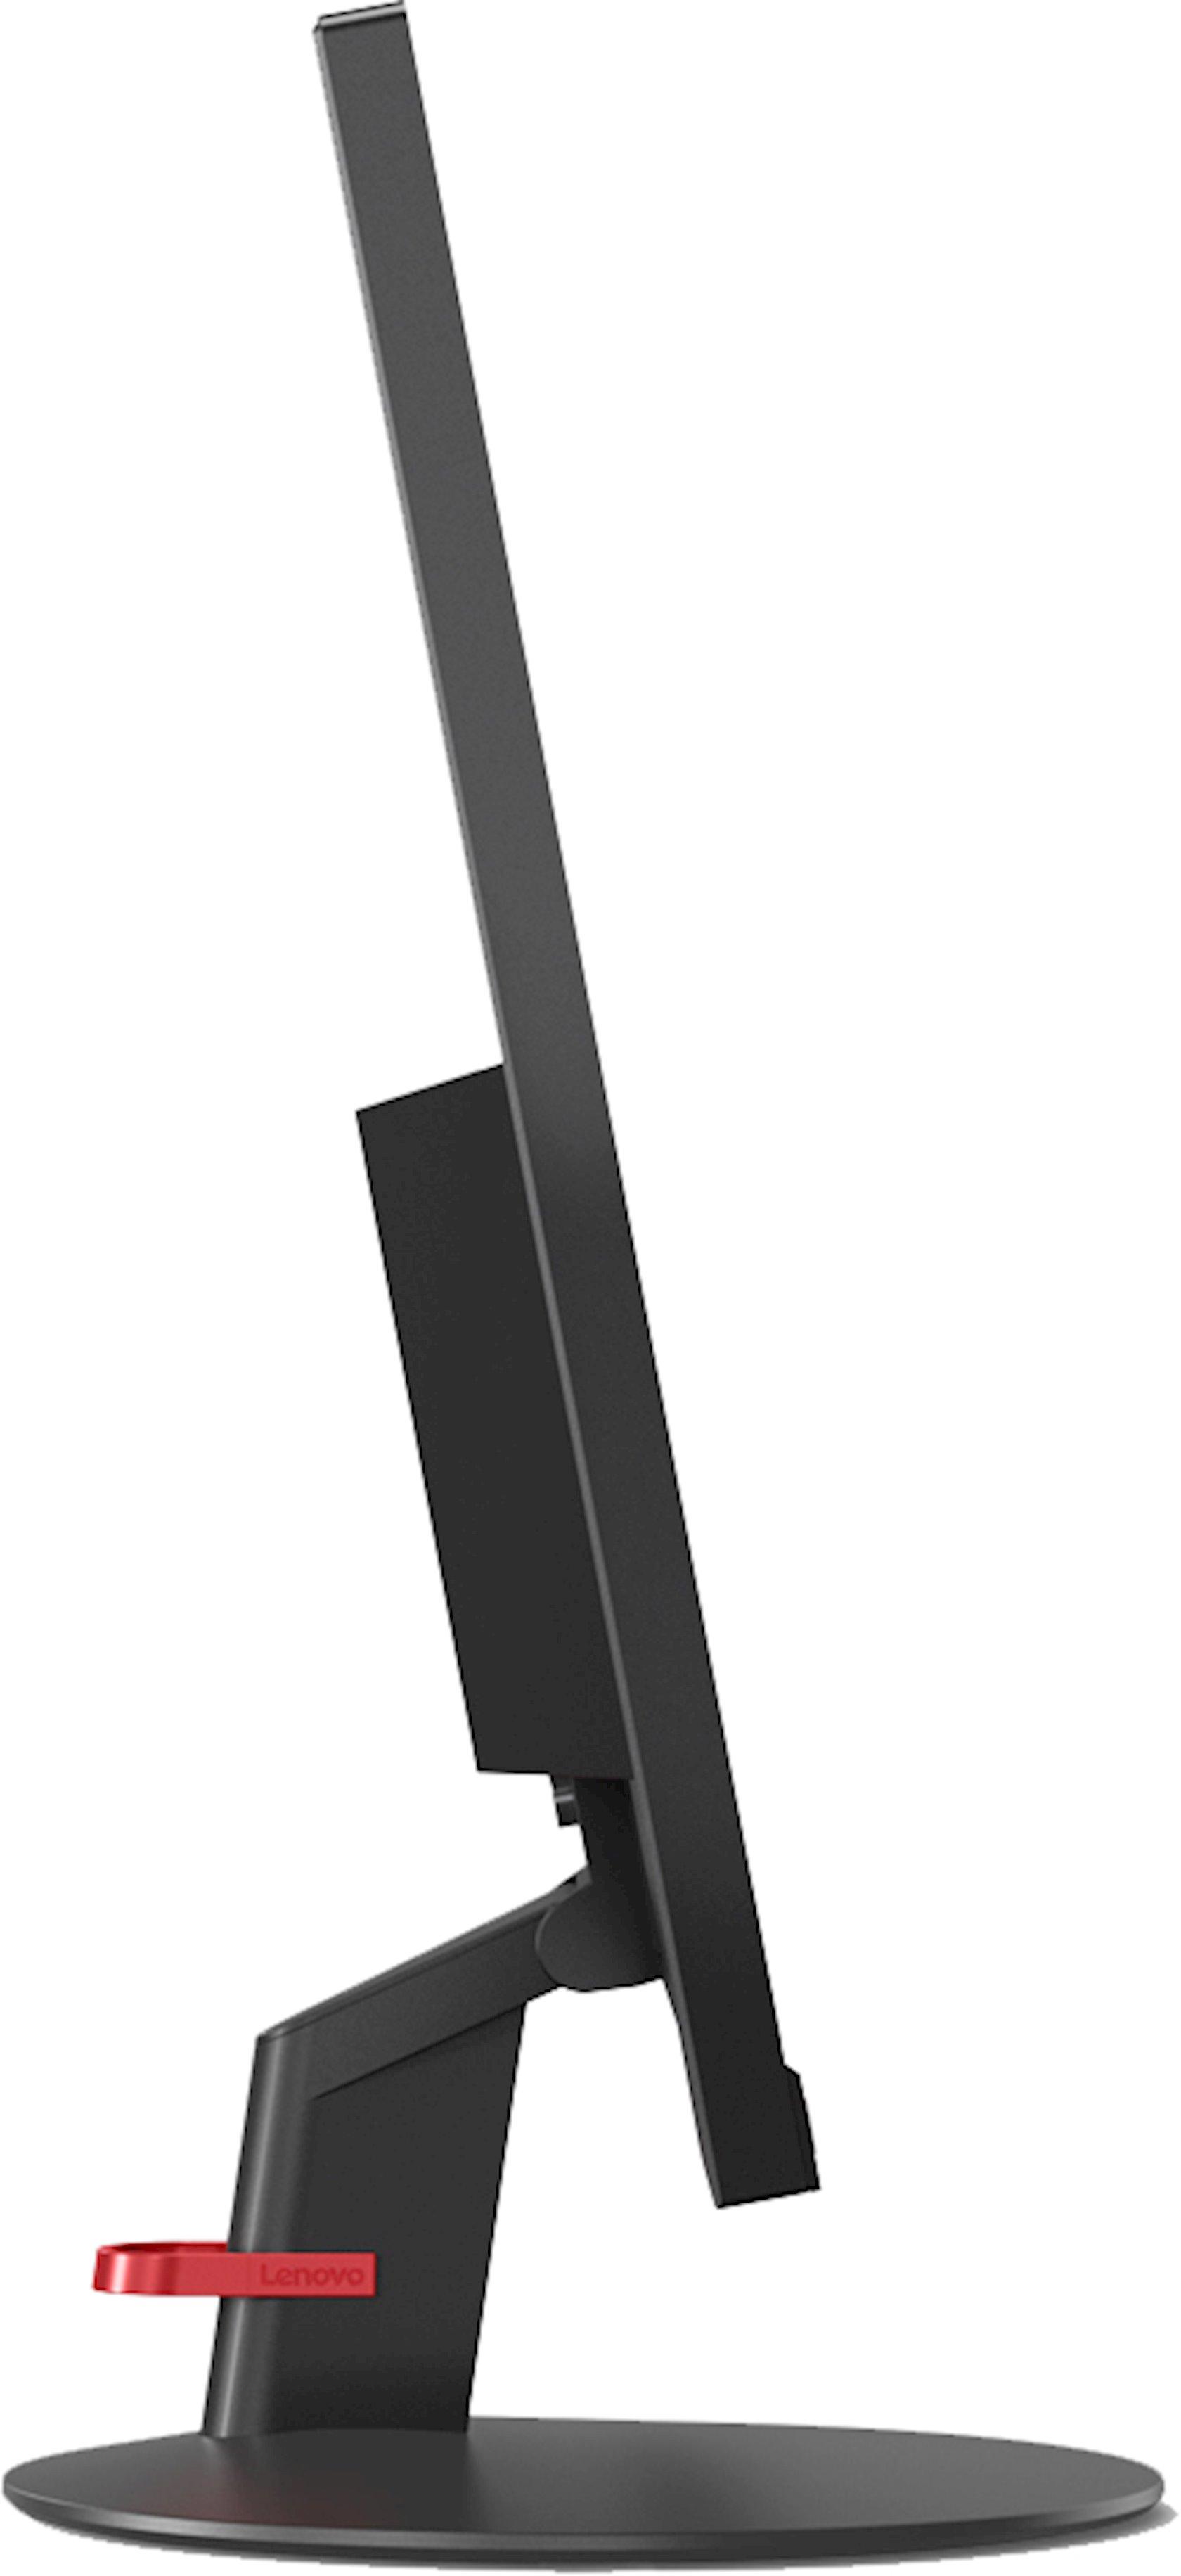 "Monitor 27"" Lenovo ThinkVision S27i-10 (61C7KAT1EU-N)"